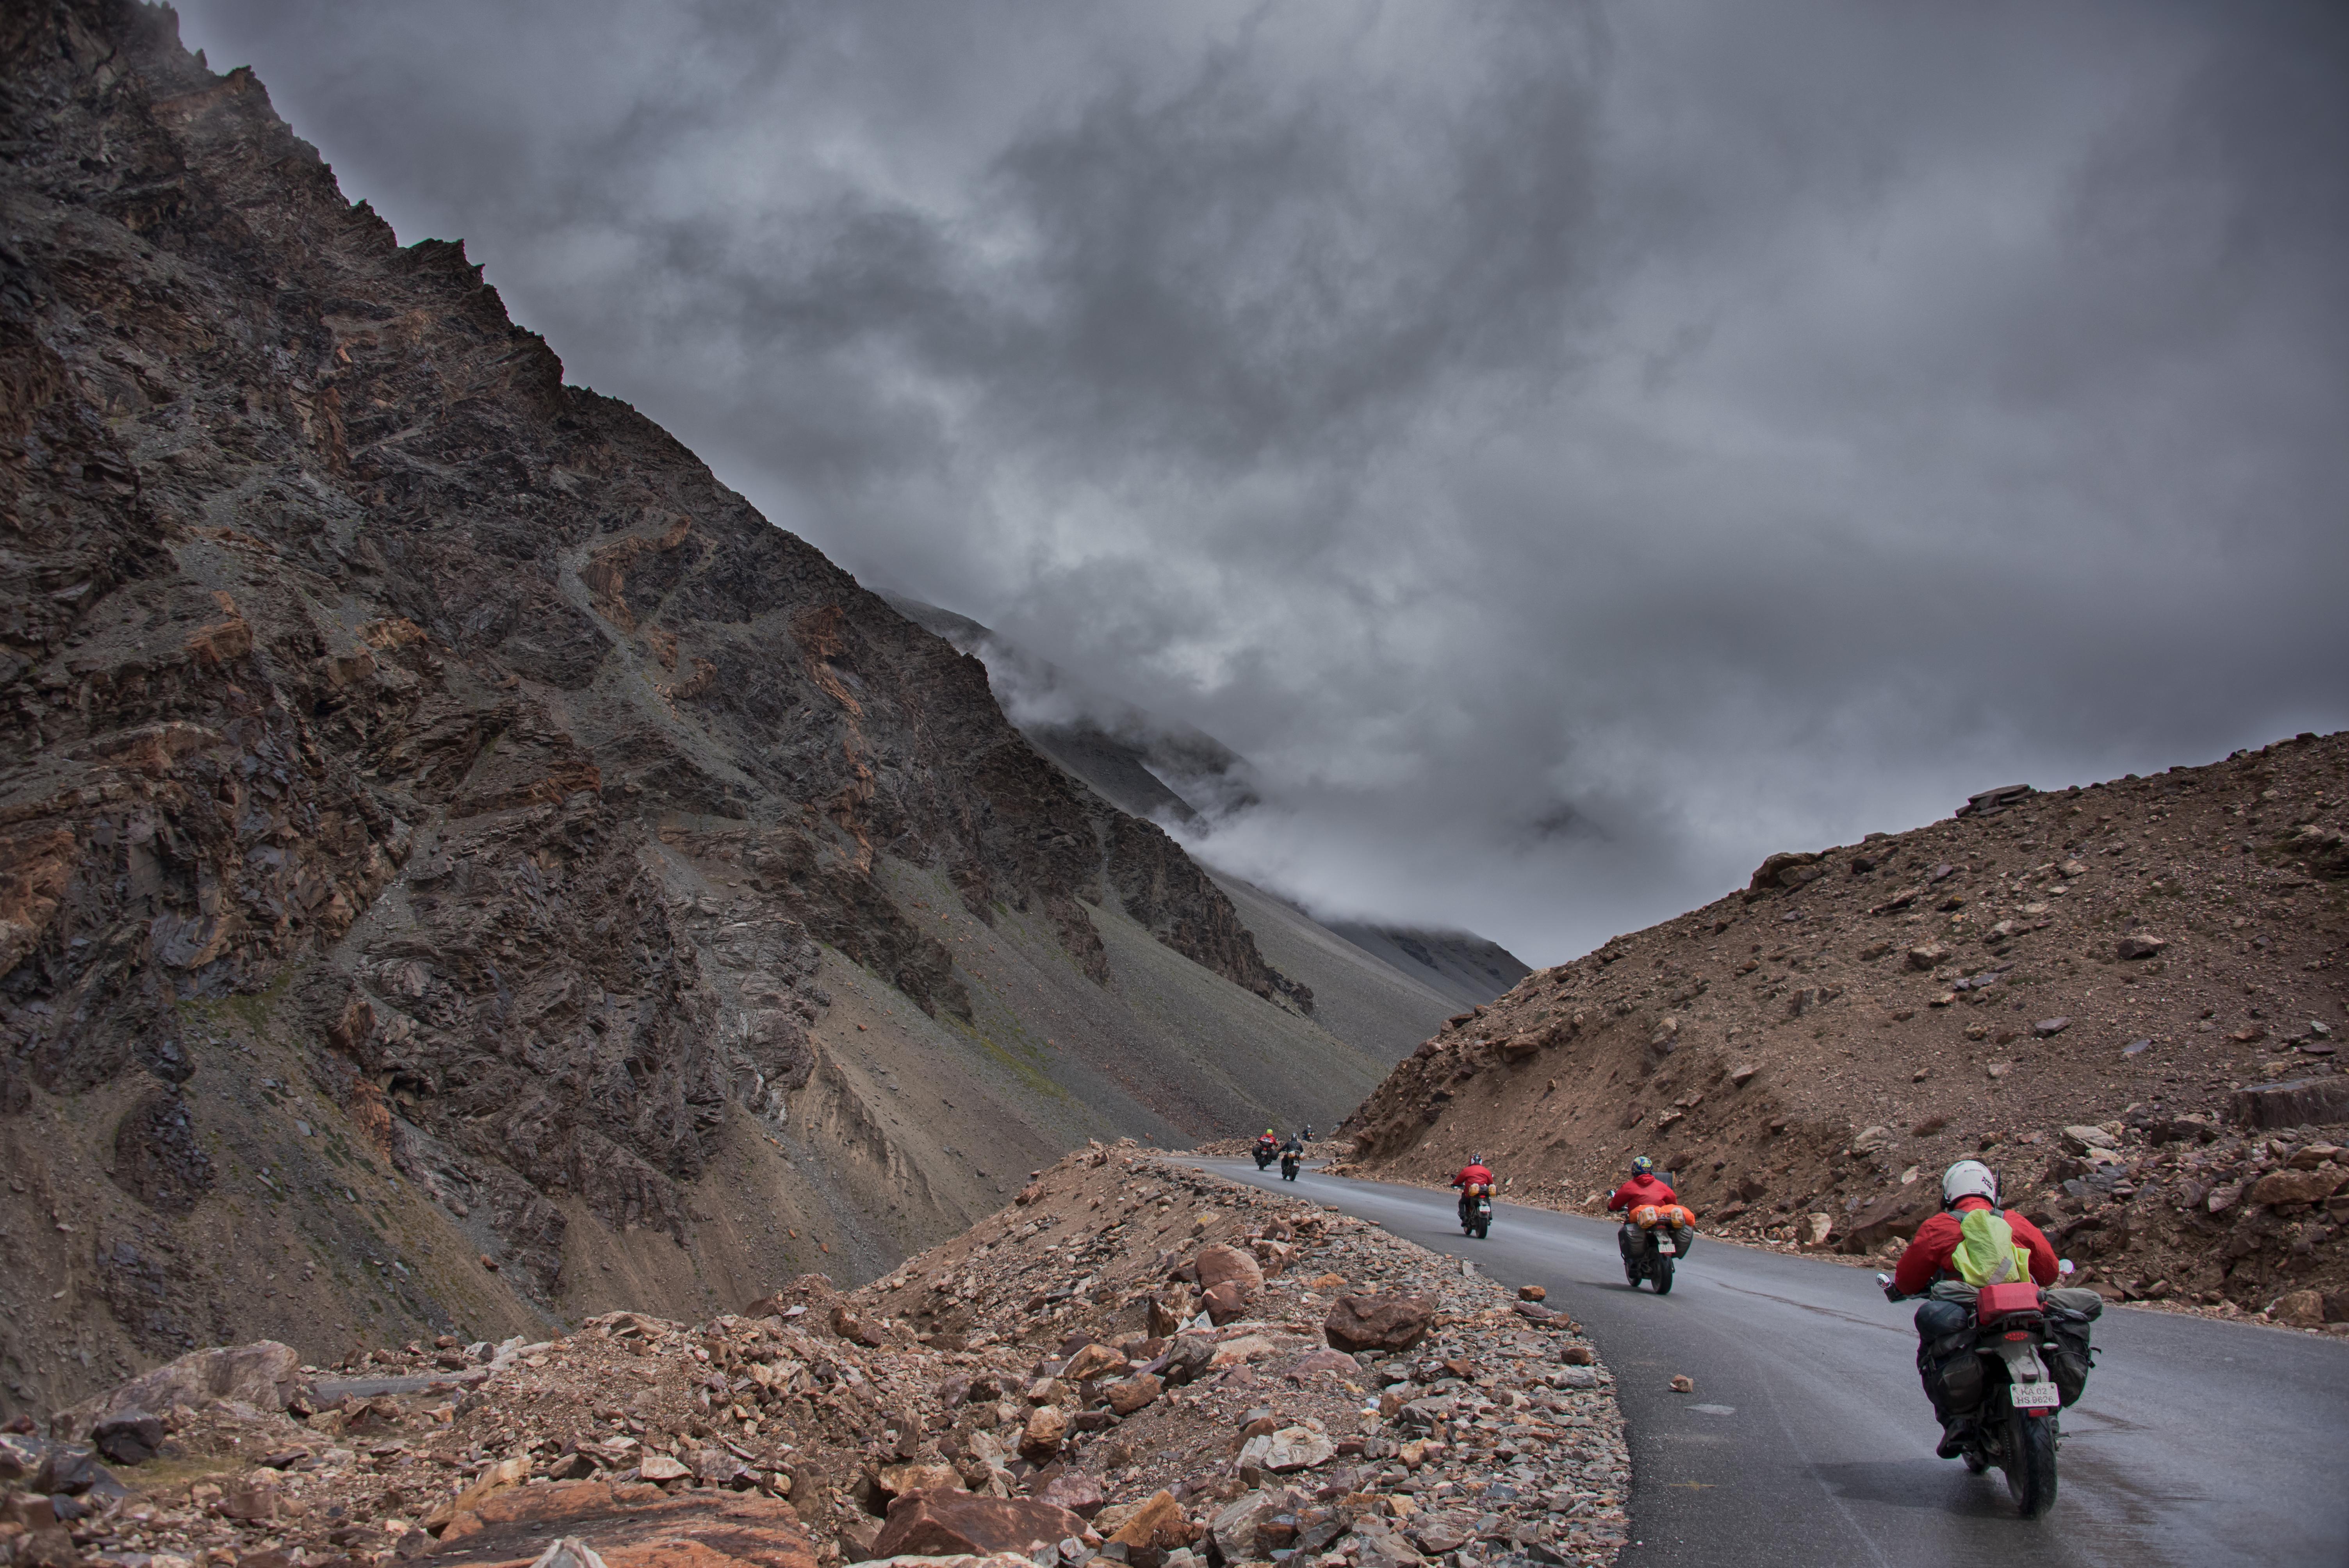 Bikers Trip To Ladakh